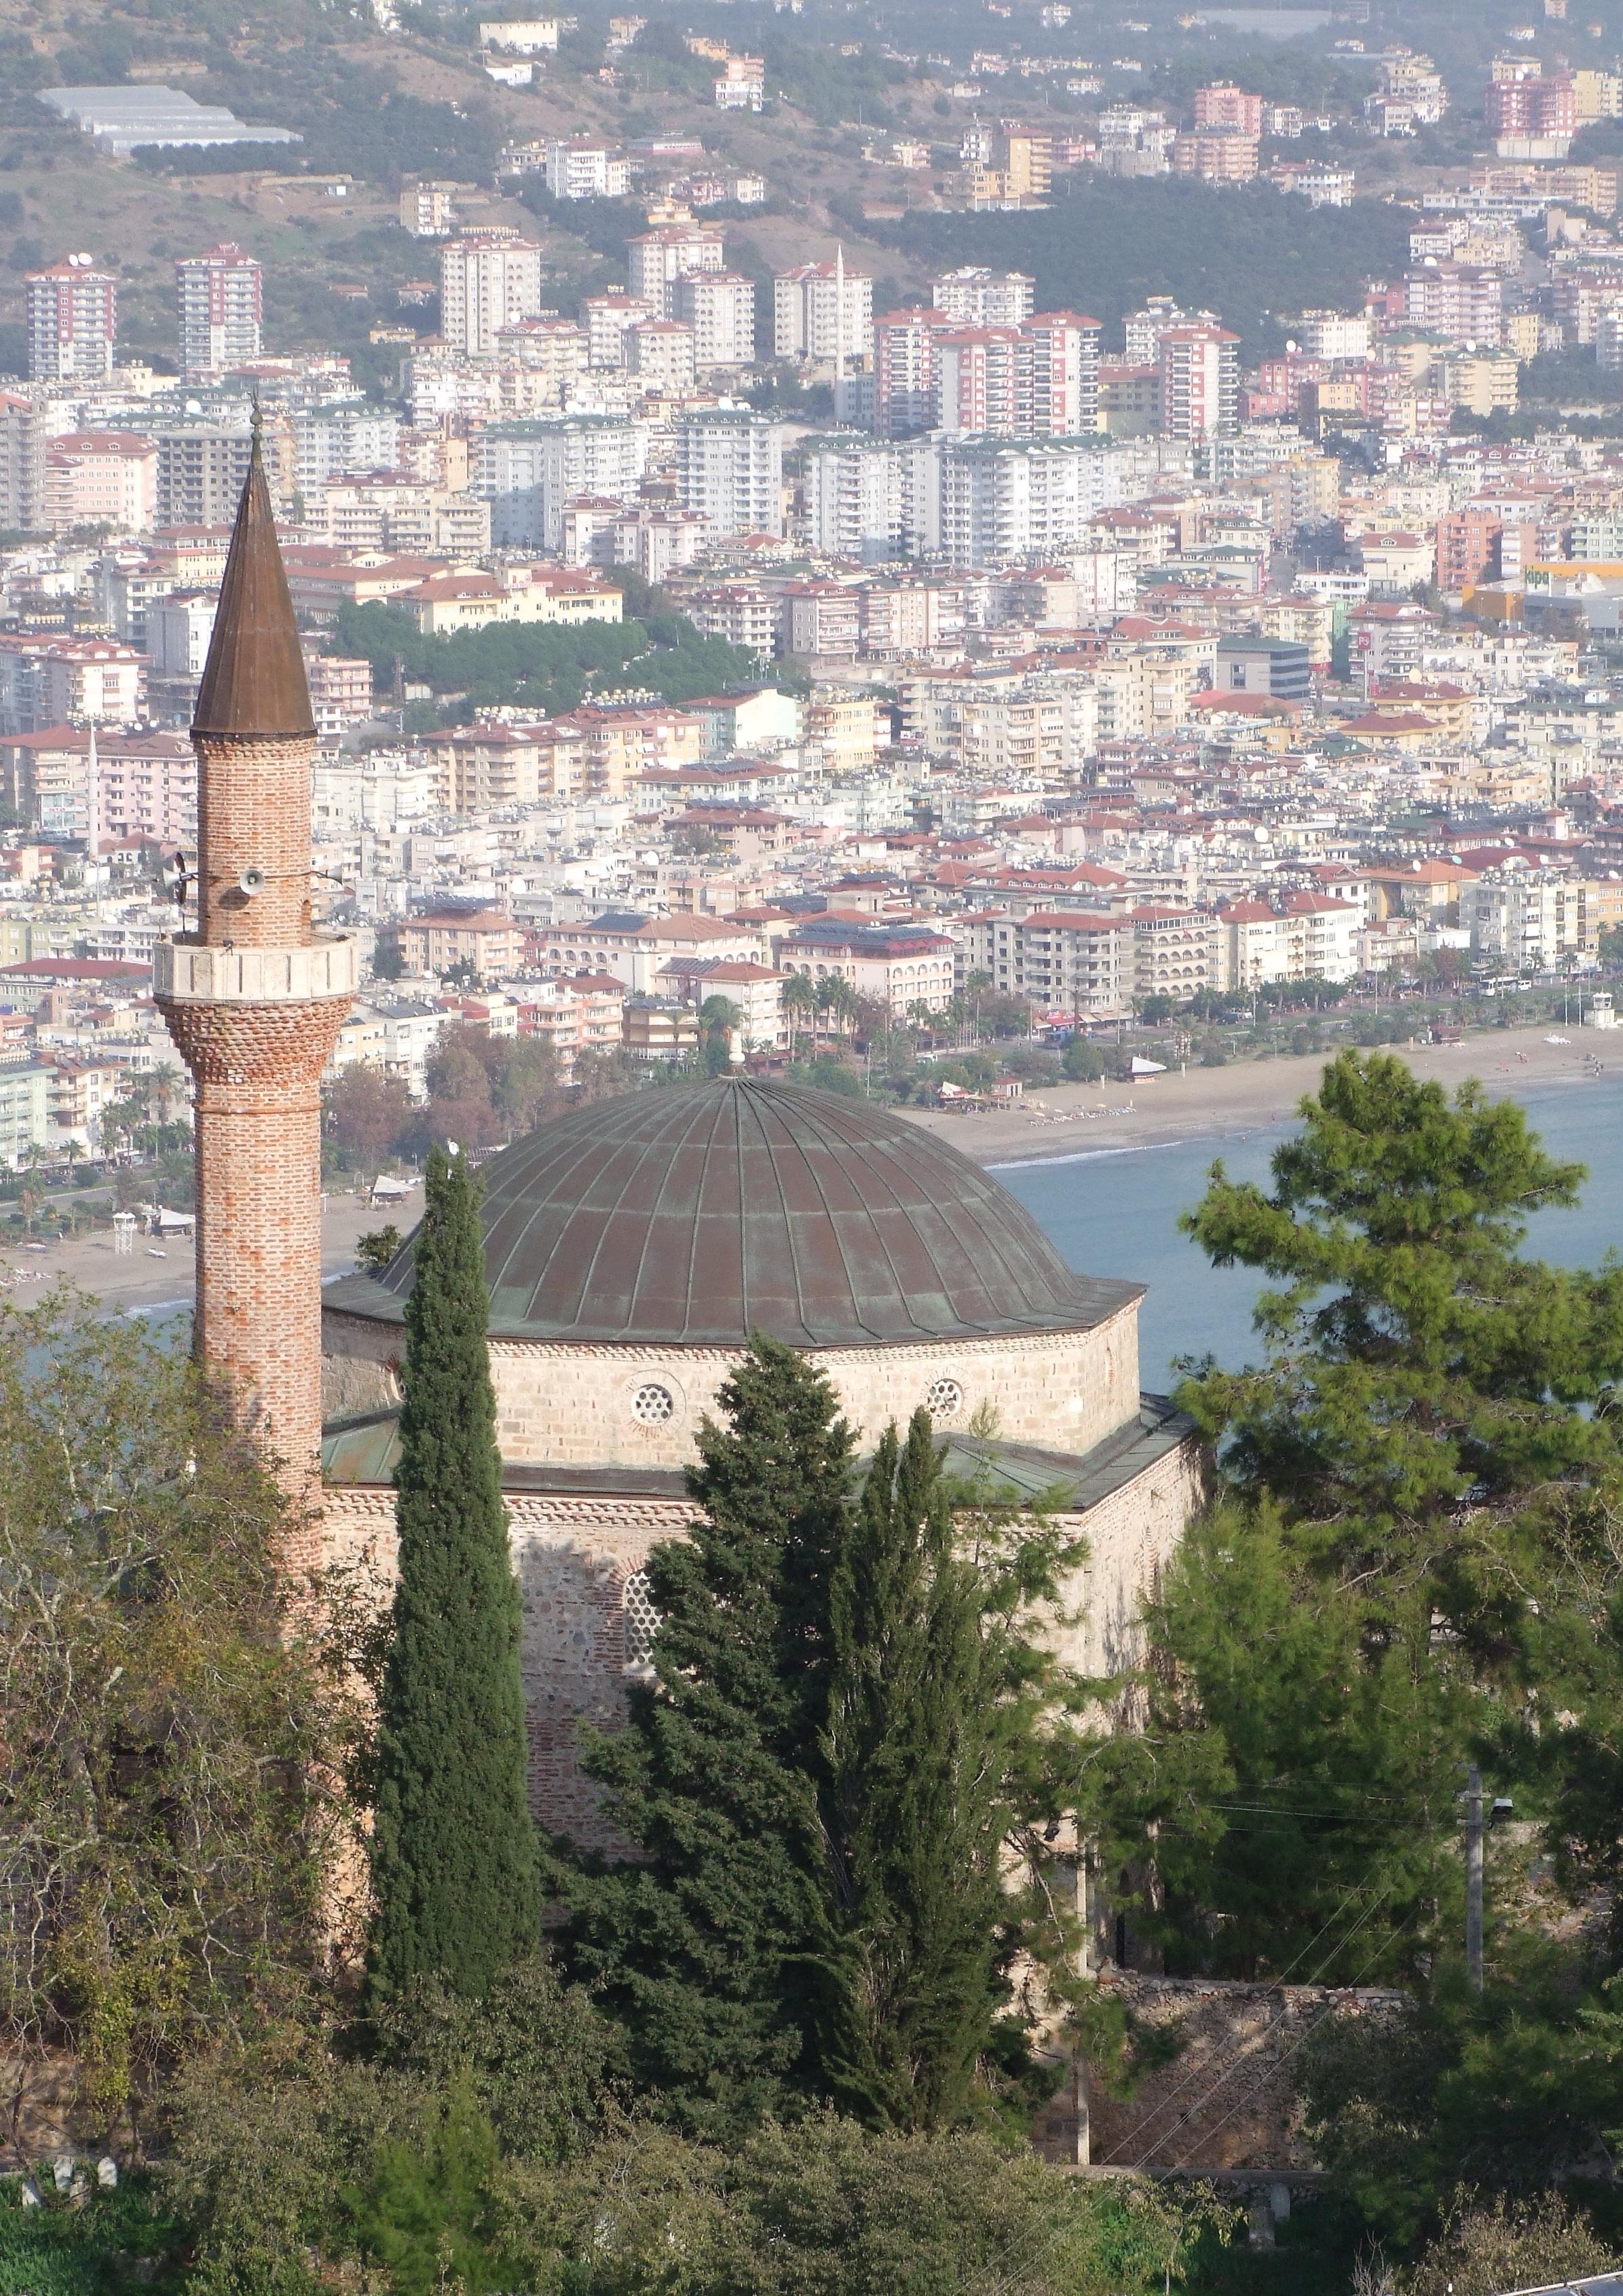 Alanya Turkey  city images : ... :Süleyman Mosque as seen from Alanya Castle Hill, Alanya, Turkey